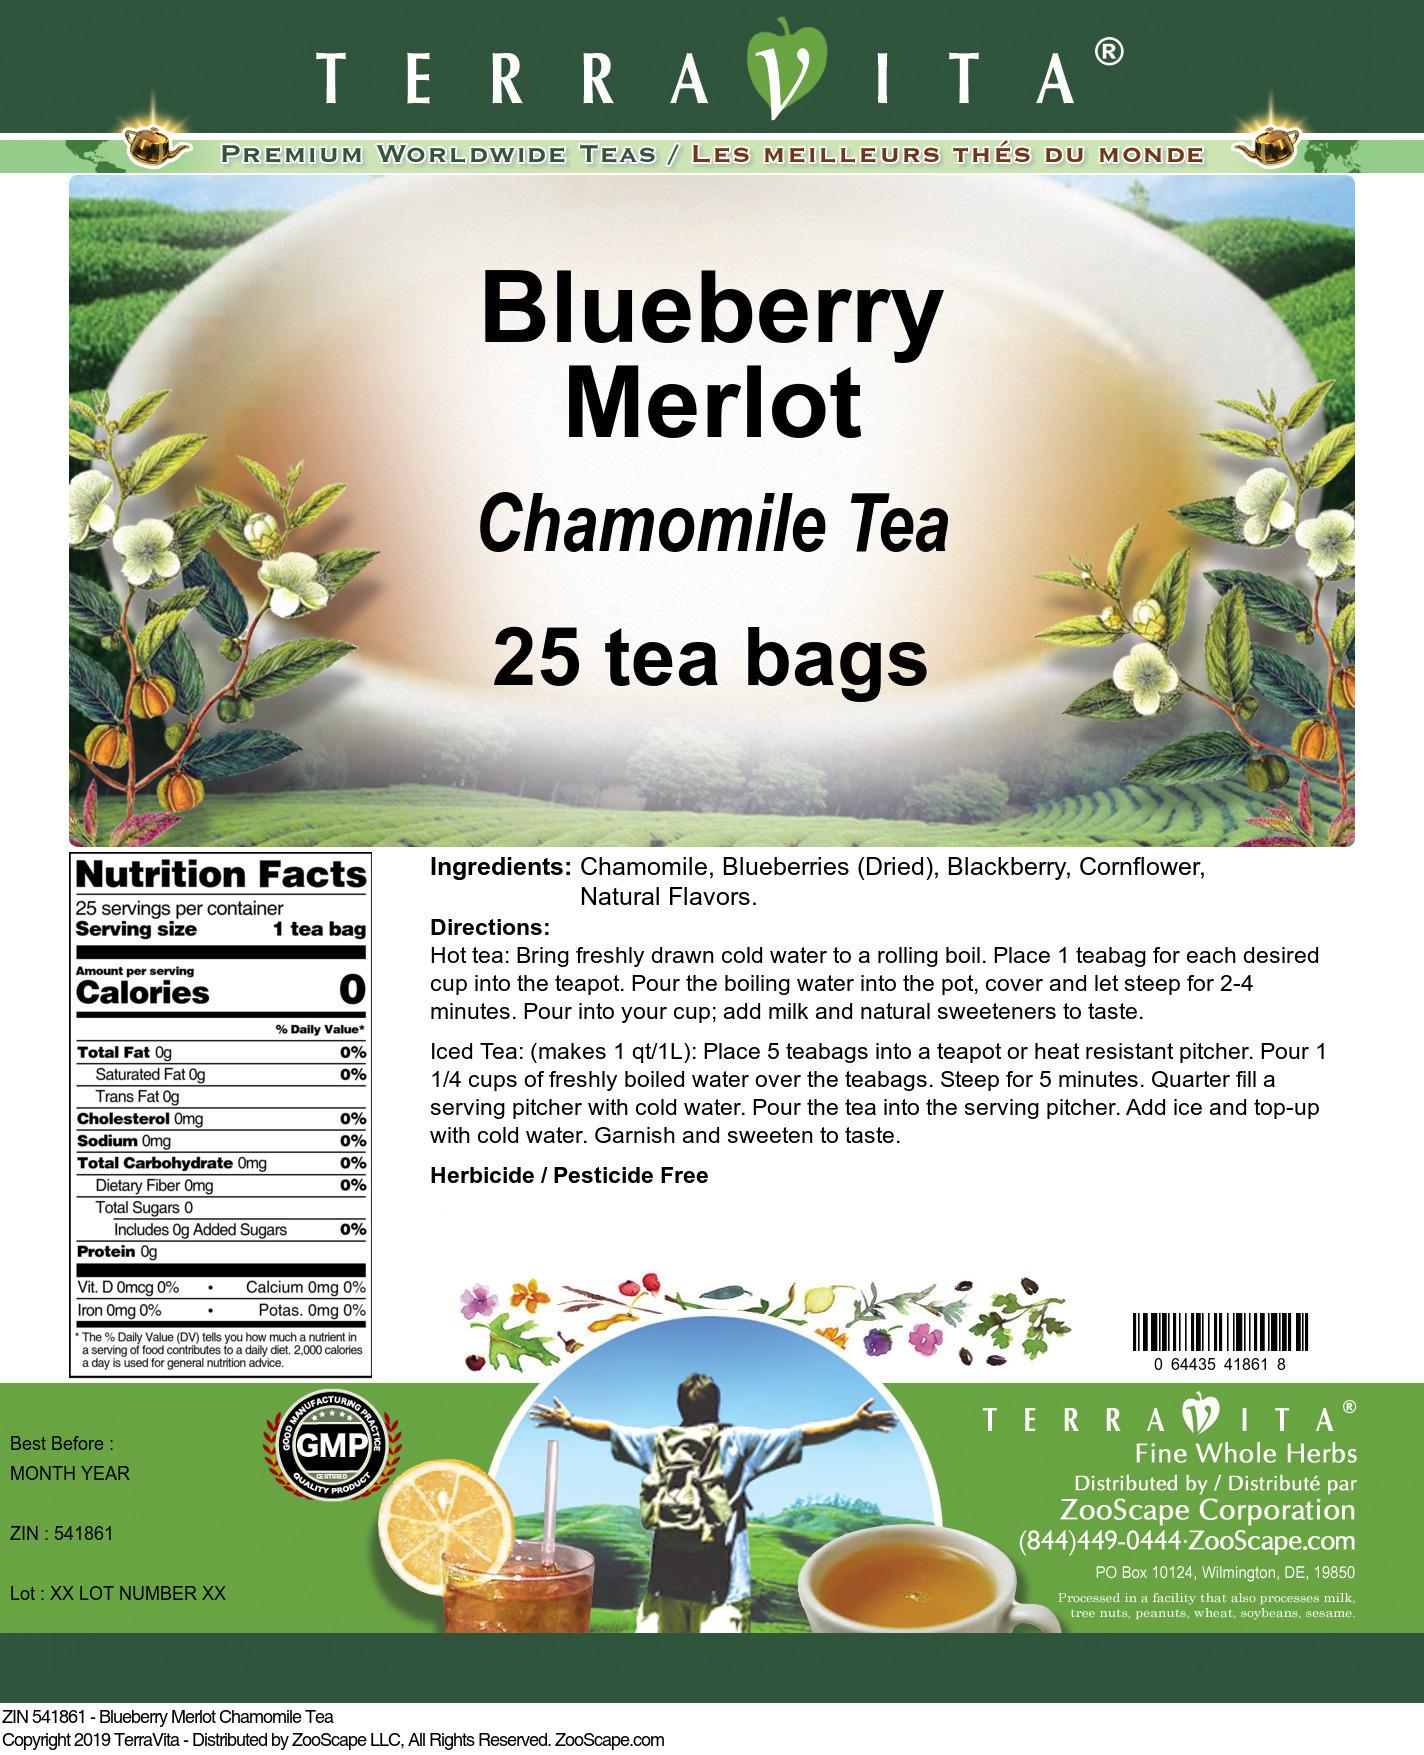 Blueberry Merlot Chamomile Tea